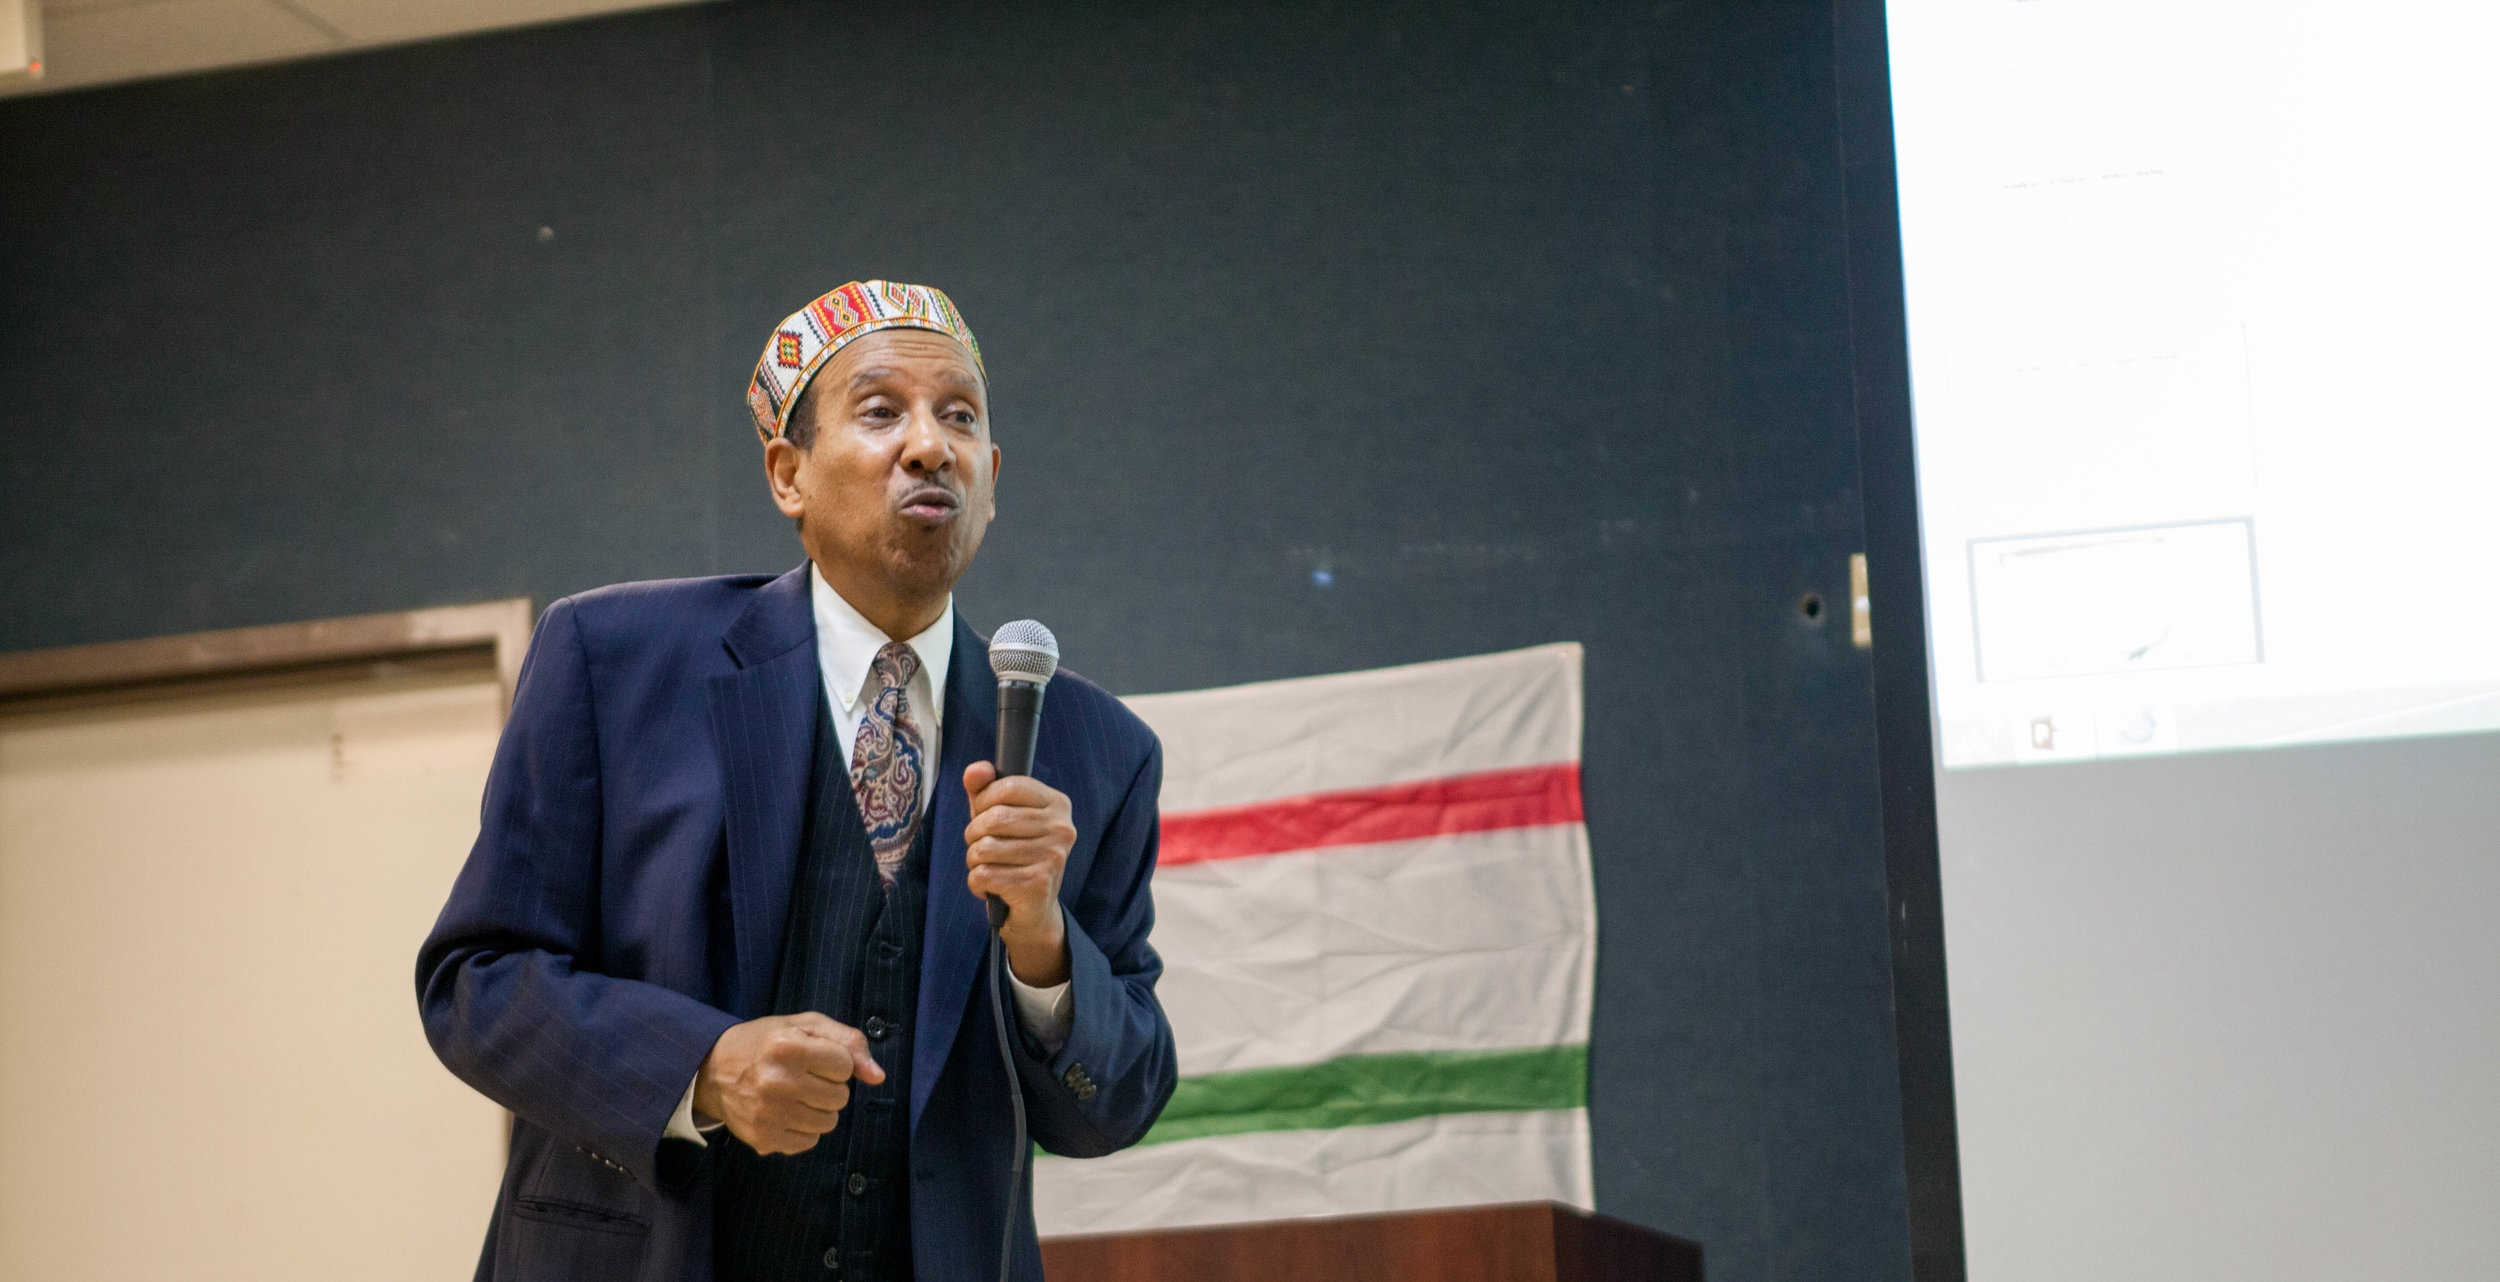 DR. ZAKI VISITS DALLAS TO DISCUSS THE PAST, PRESENT, AND FUTURE OF HARAR.   Read Post